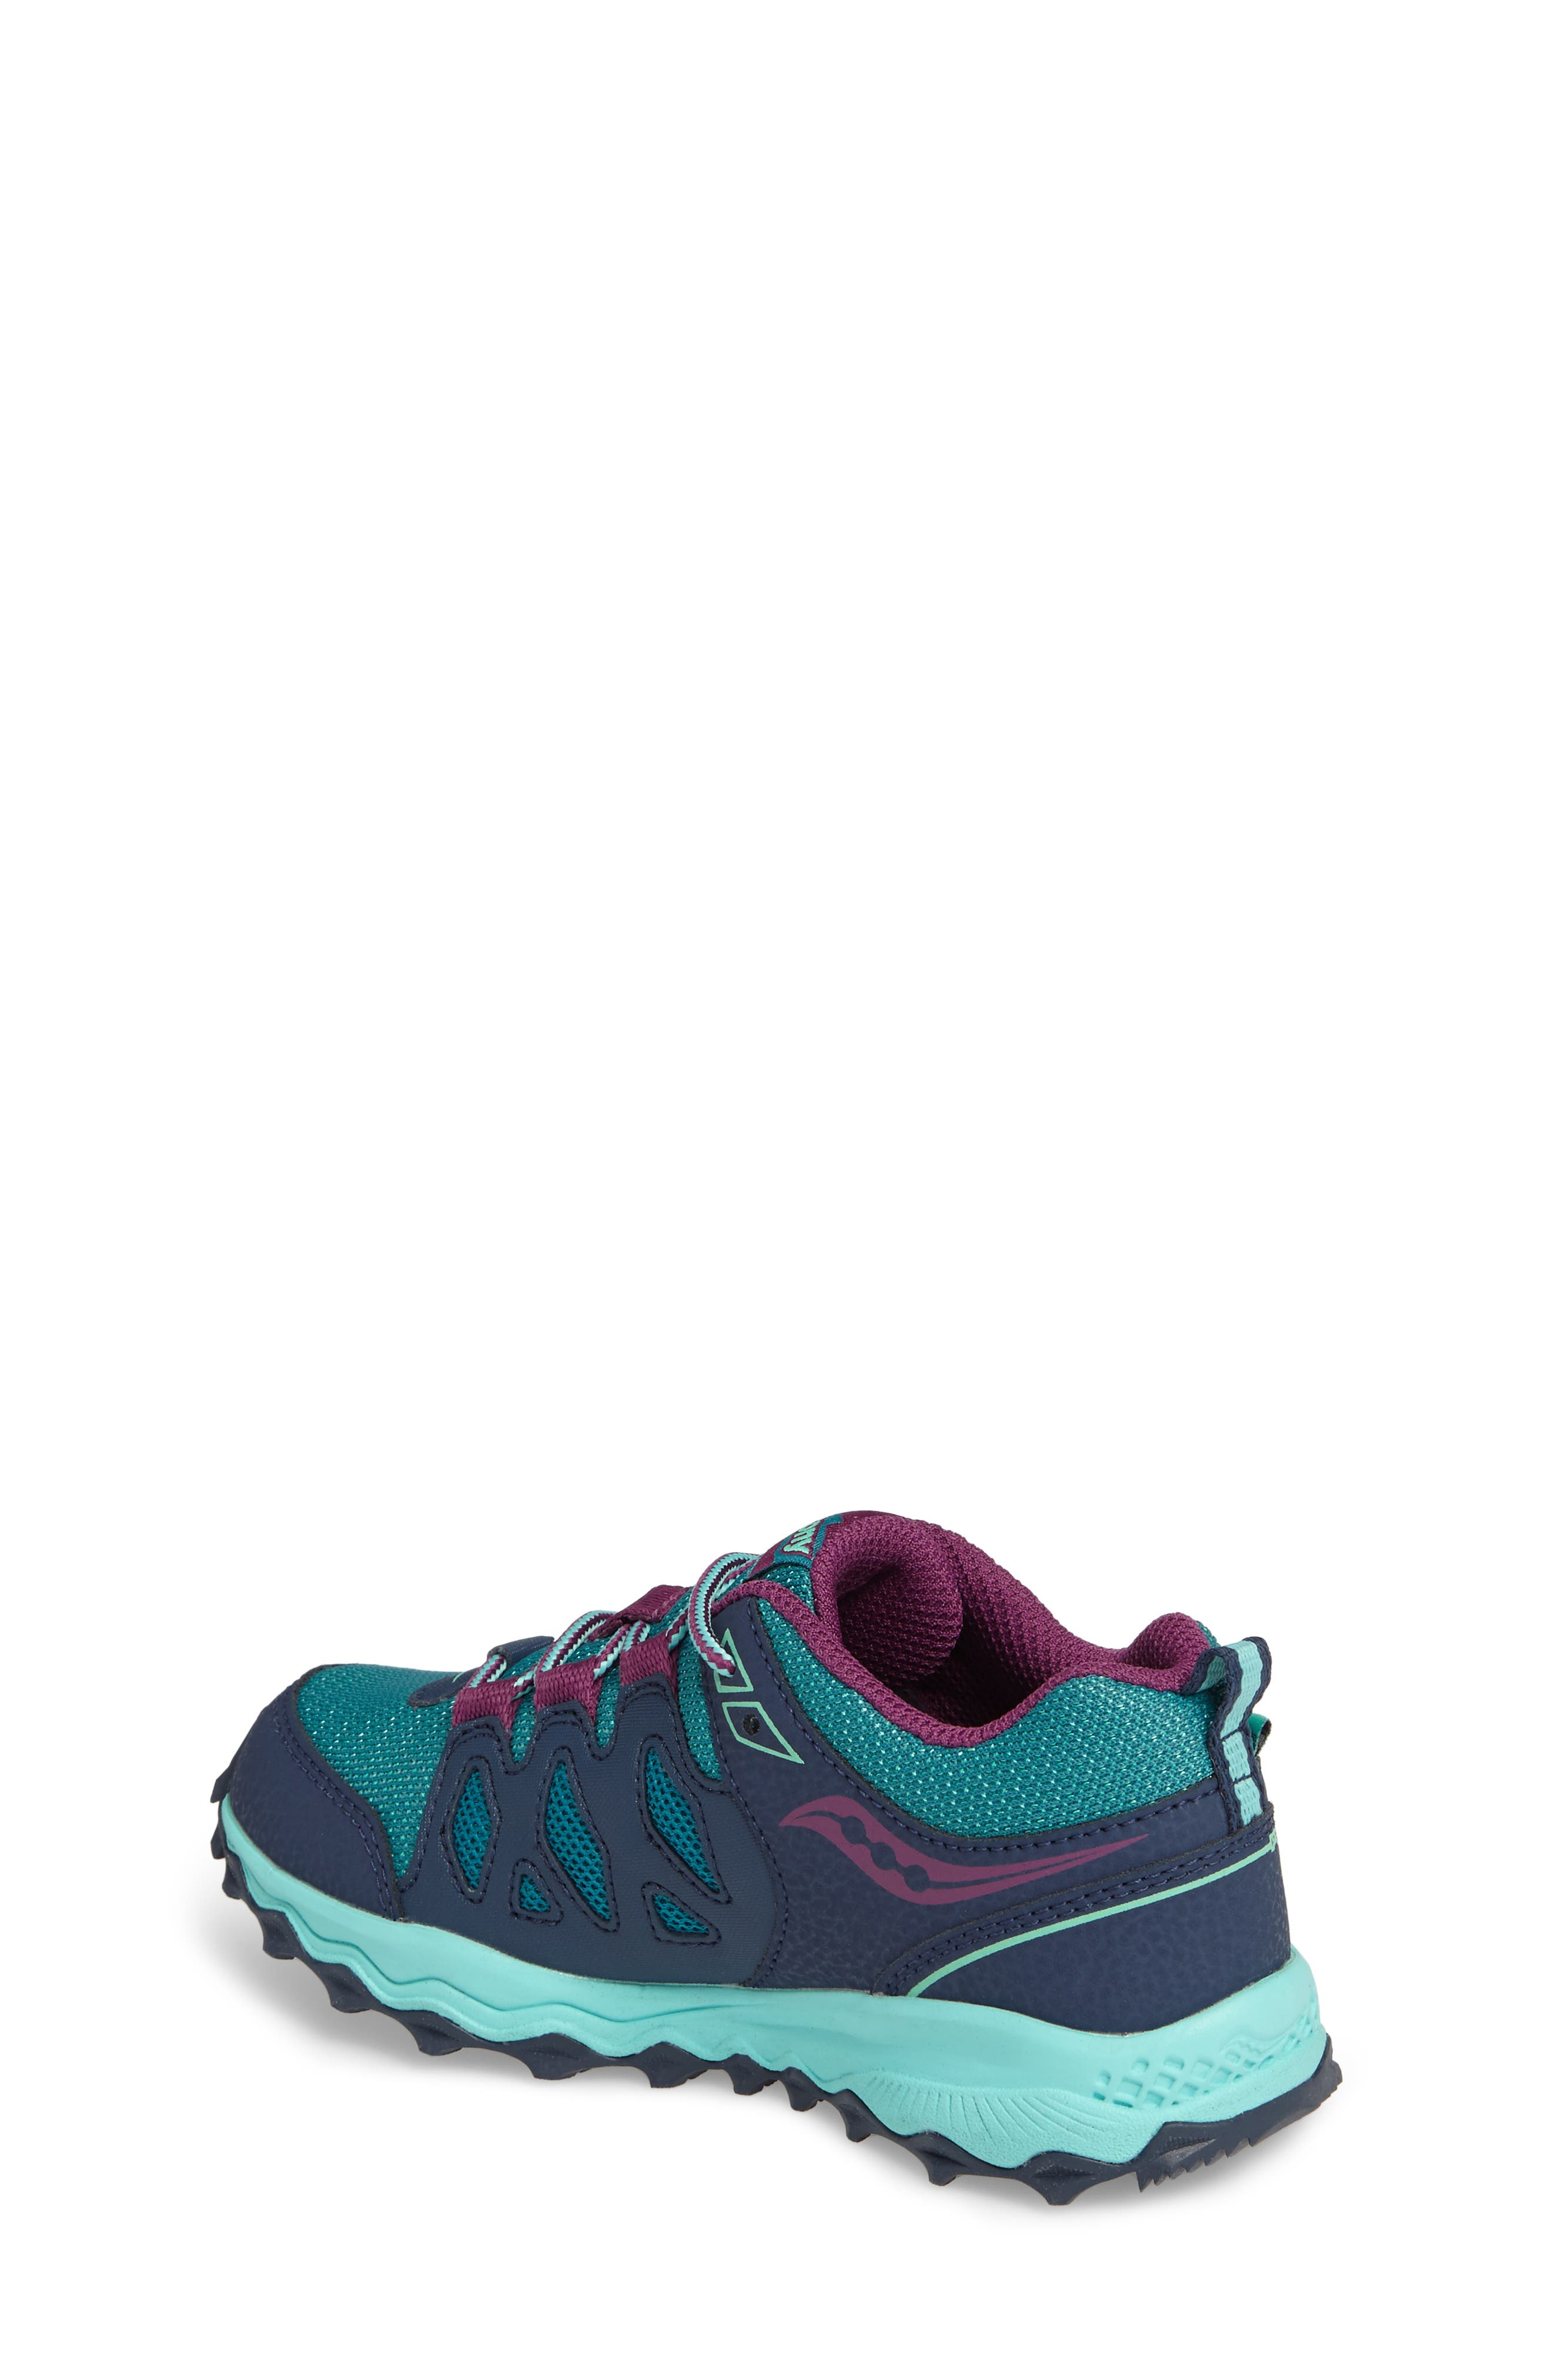 Peregrine Shield Water-Resistant Sneaker,                             Alternate thumbnail 2, color,                             440